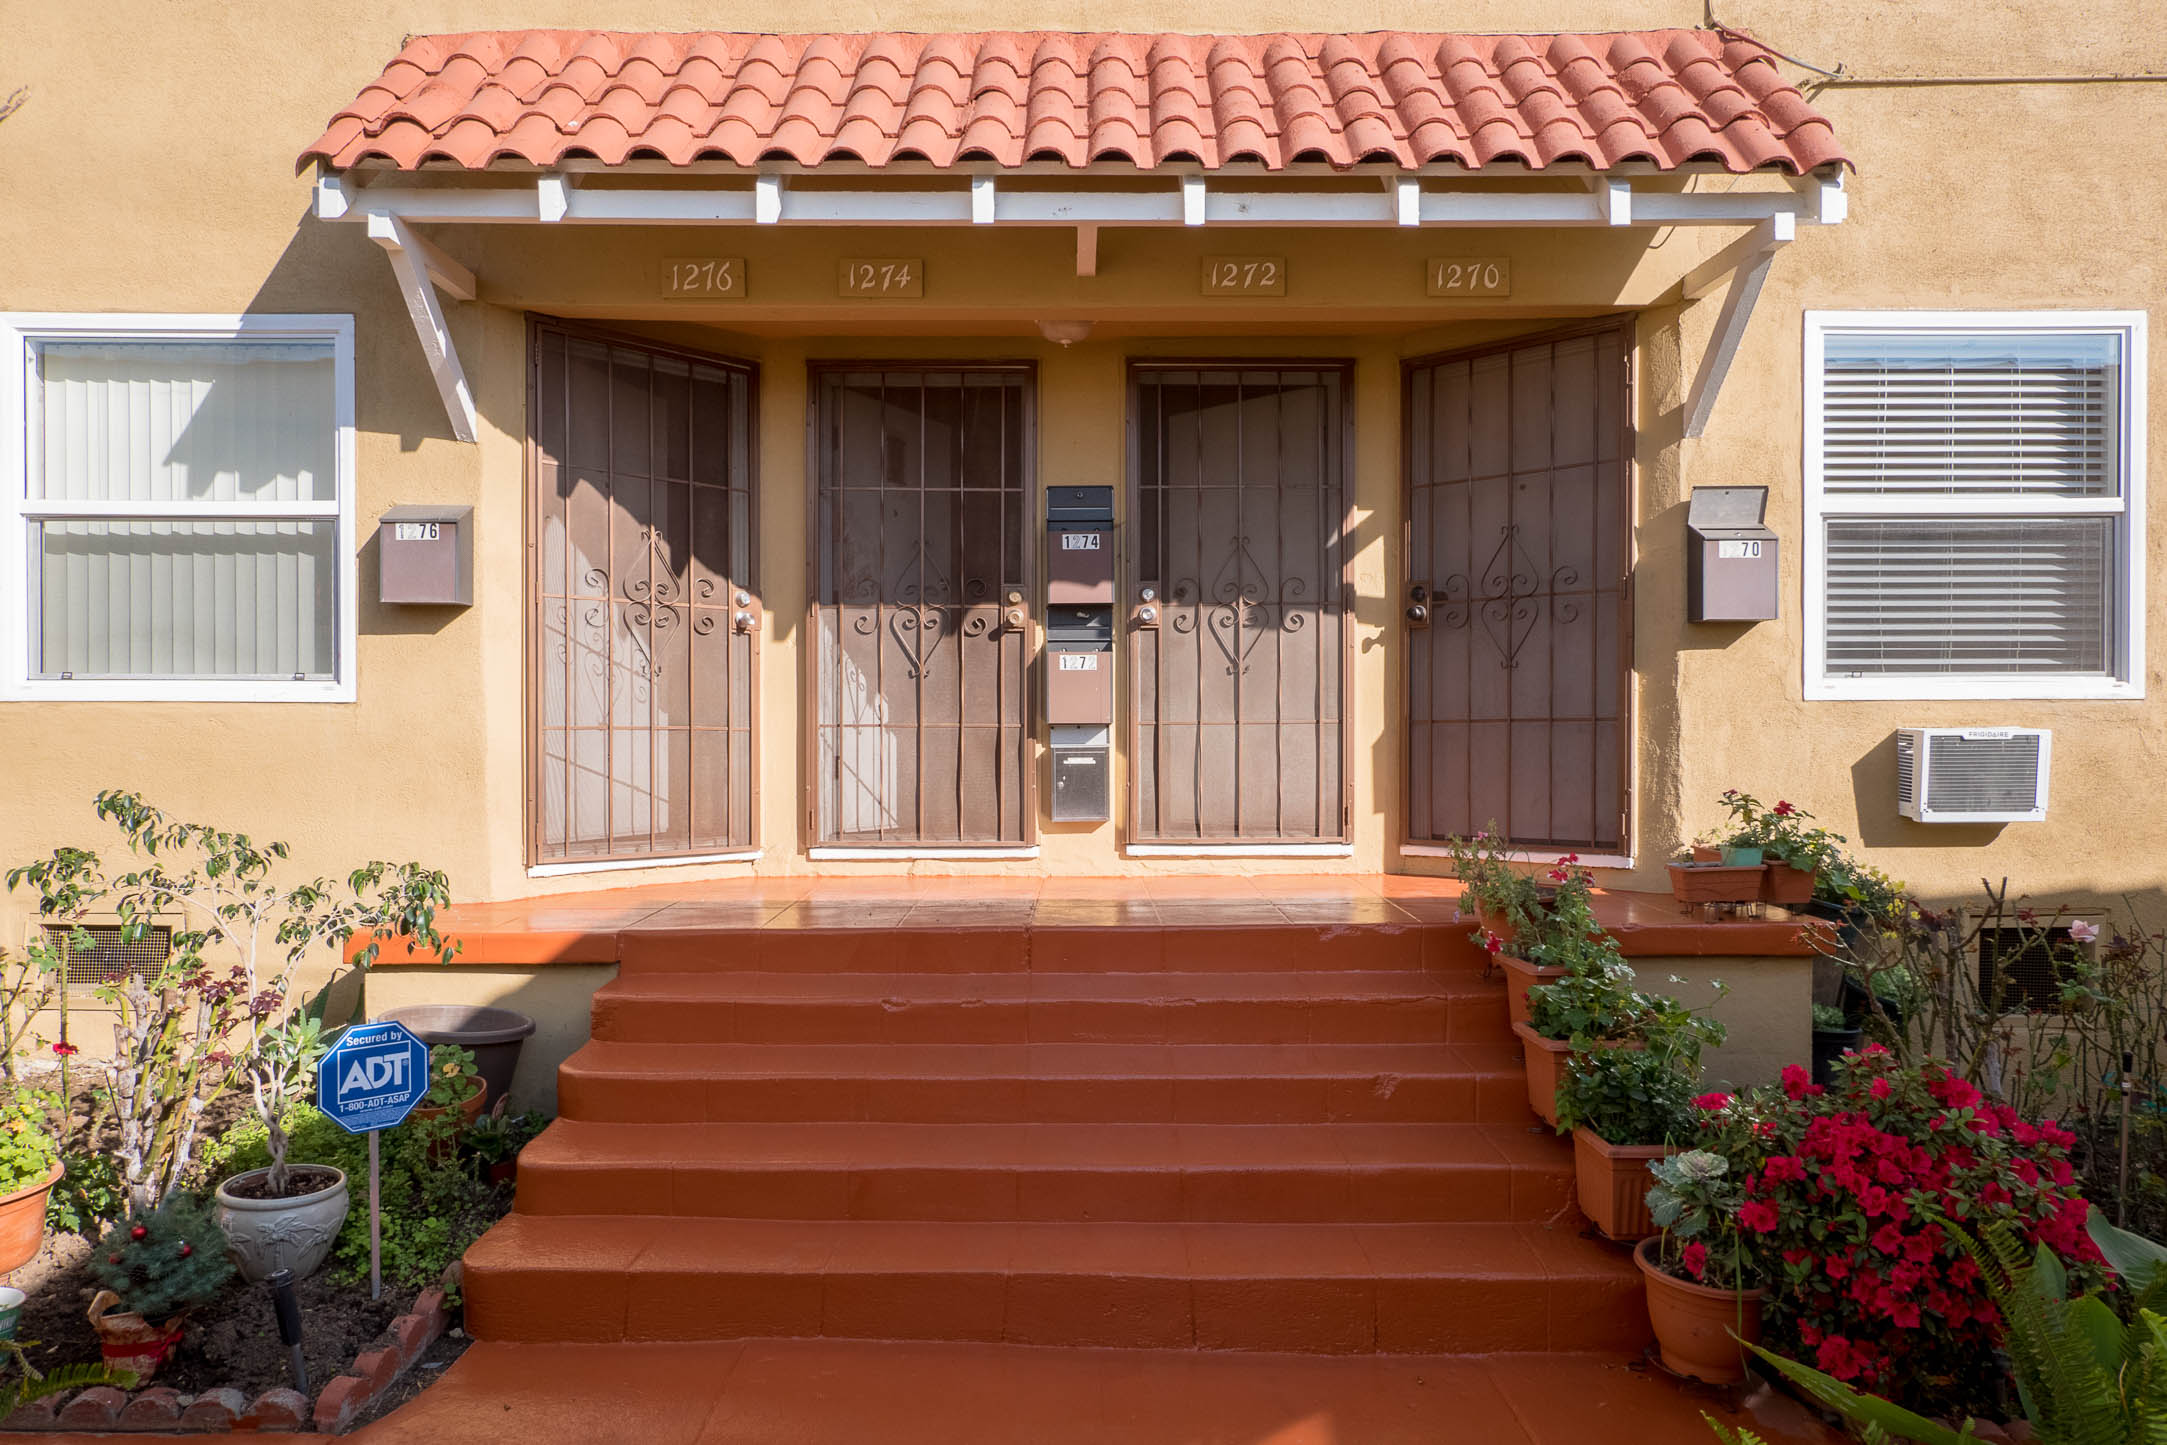 Virgil Village Spanish 4-plex | Near Dinosaur Coffee,  Akbar, Malo and Bar Angeles